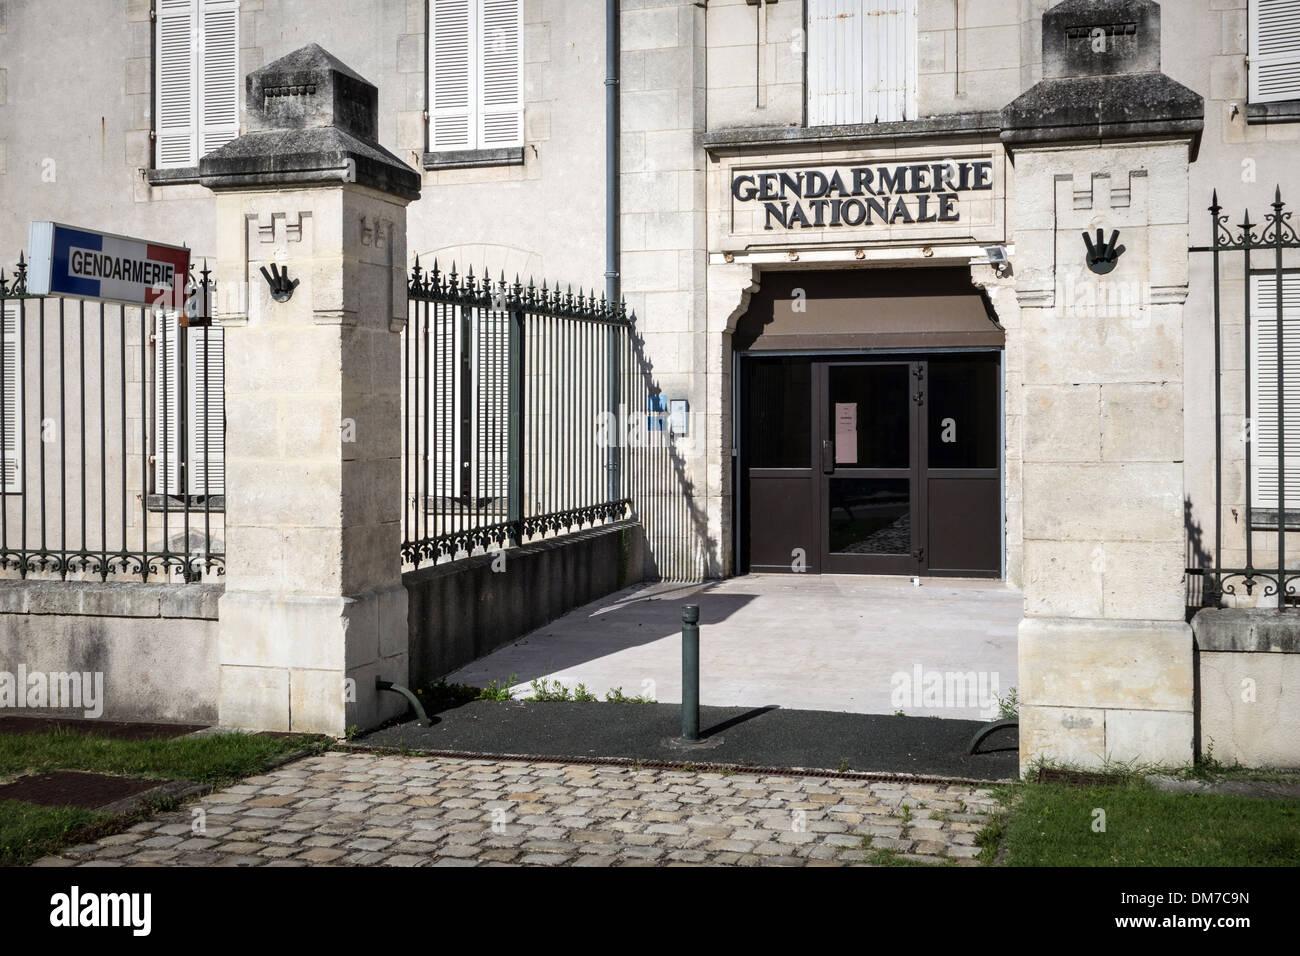 ENTRANCE TO THE NATIONAL GENDARMERIE, ROCHEFORT, CHARENTE-MARITIME (17), FRANCE - Stock Image